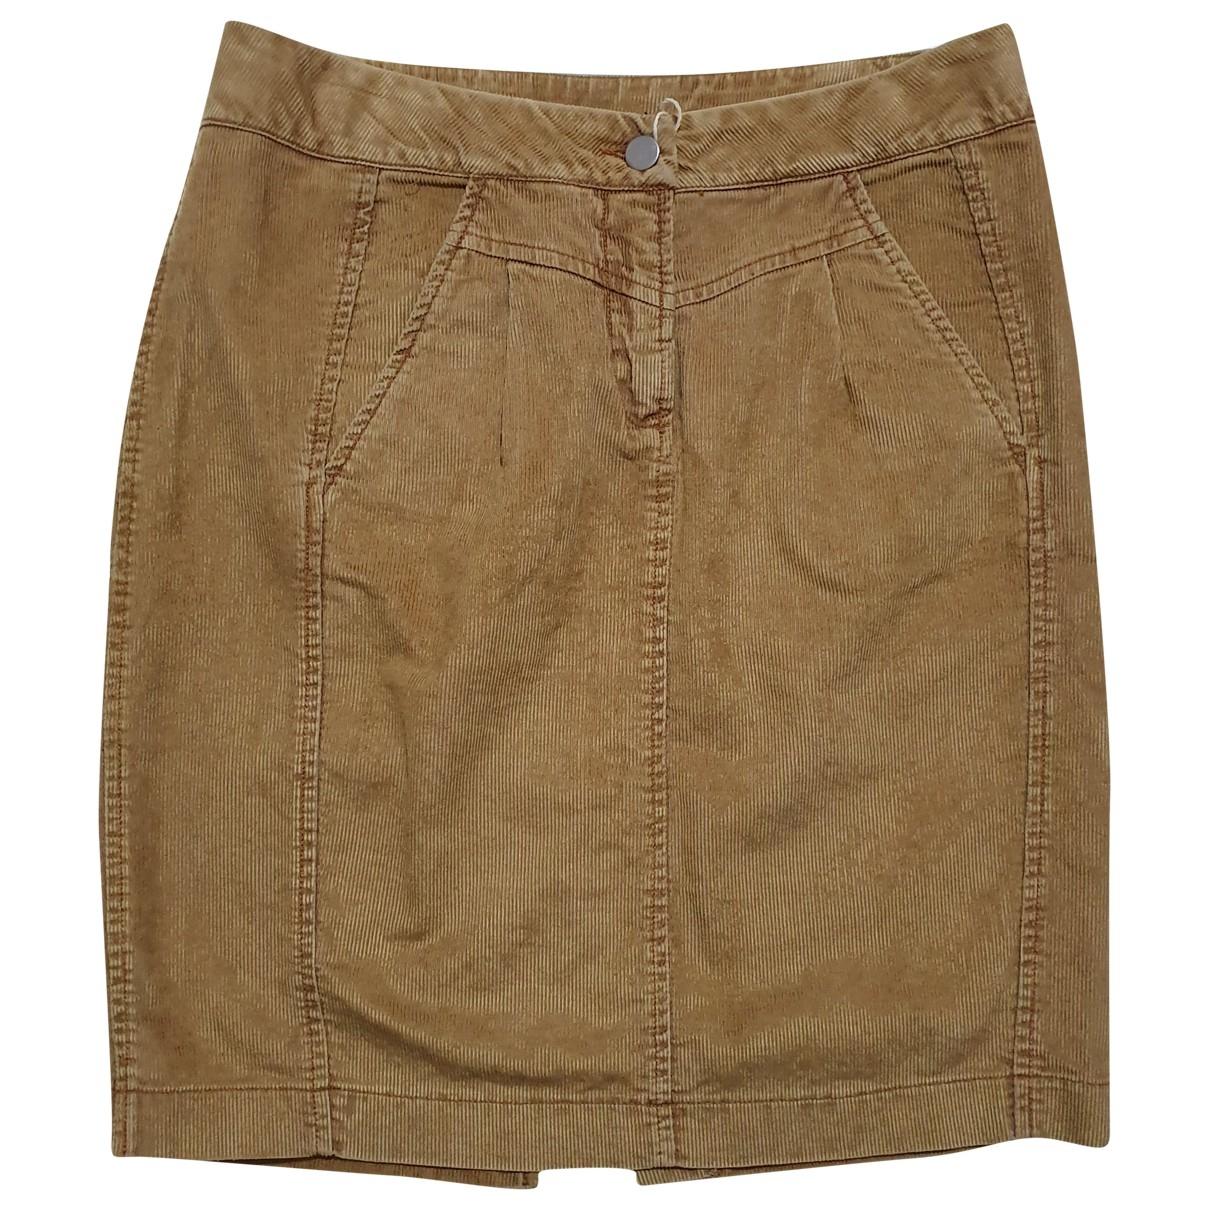 Evisu \N Brown Cotton skirt for Women M International